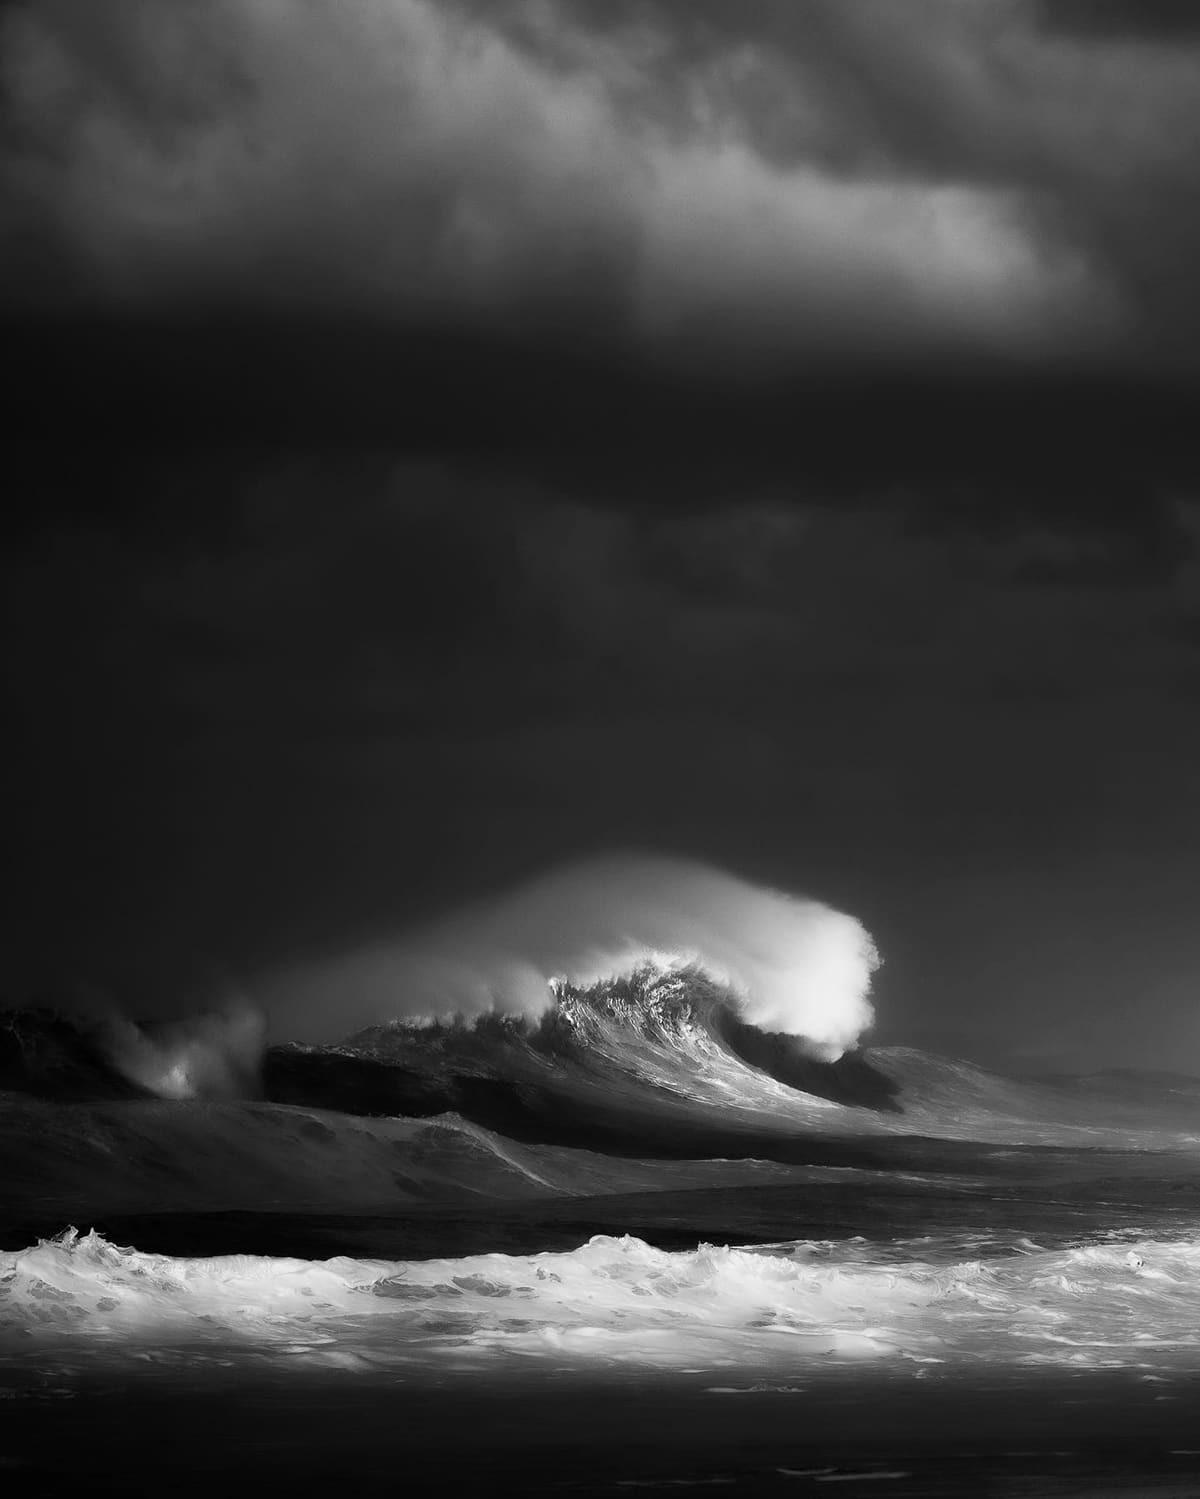 Снимки морских волн от голландского фотографа